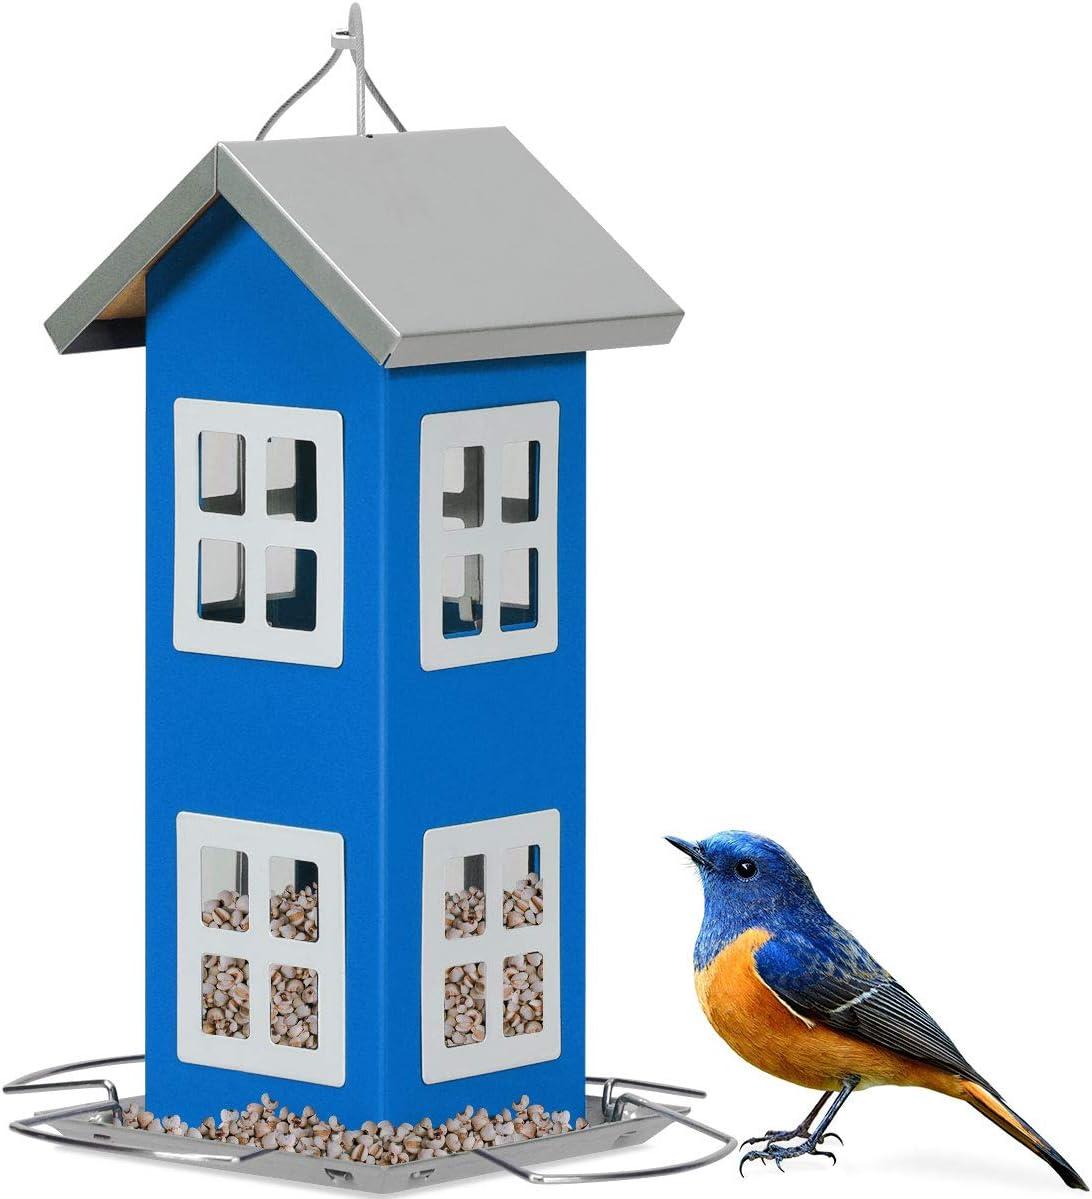 COSTWAY Comedero Colgante para Aves Alimentador de Pájaros 26x12x12cm para Jardín Patio Alféizar Exterior (Azul)